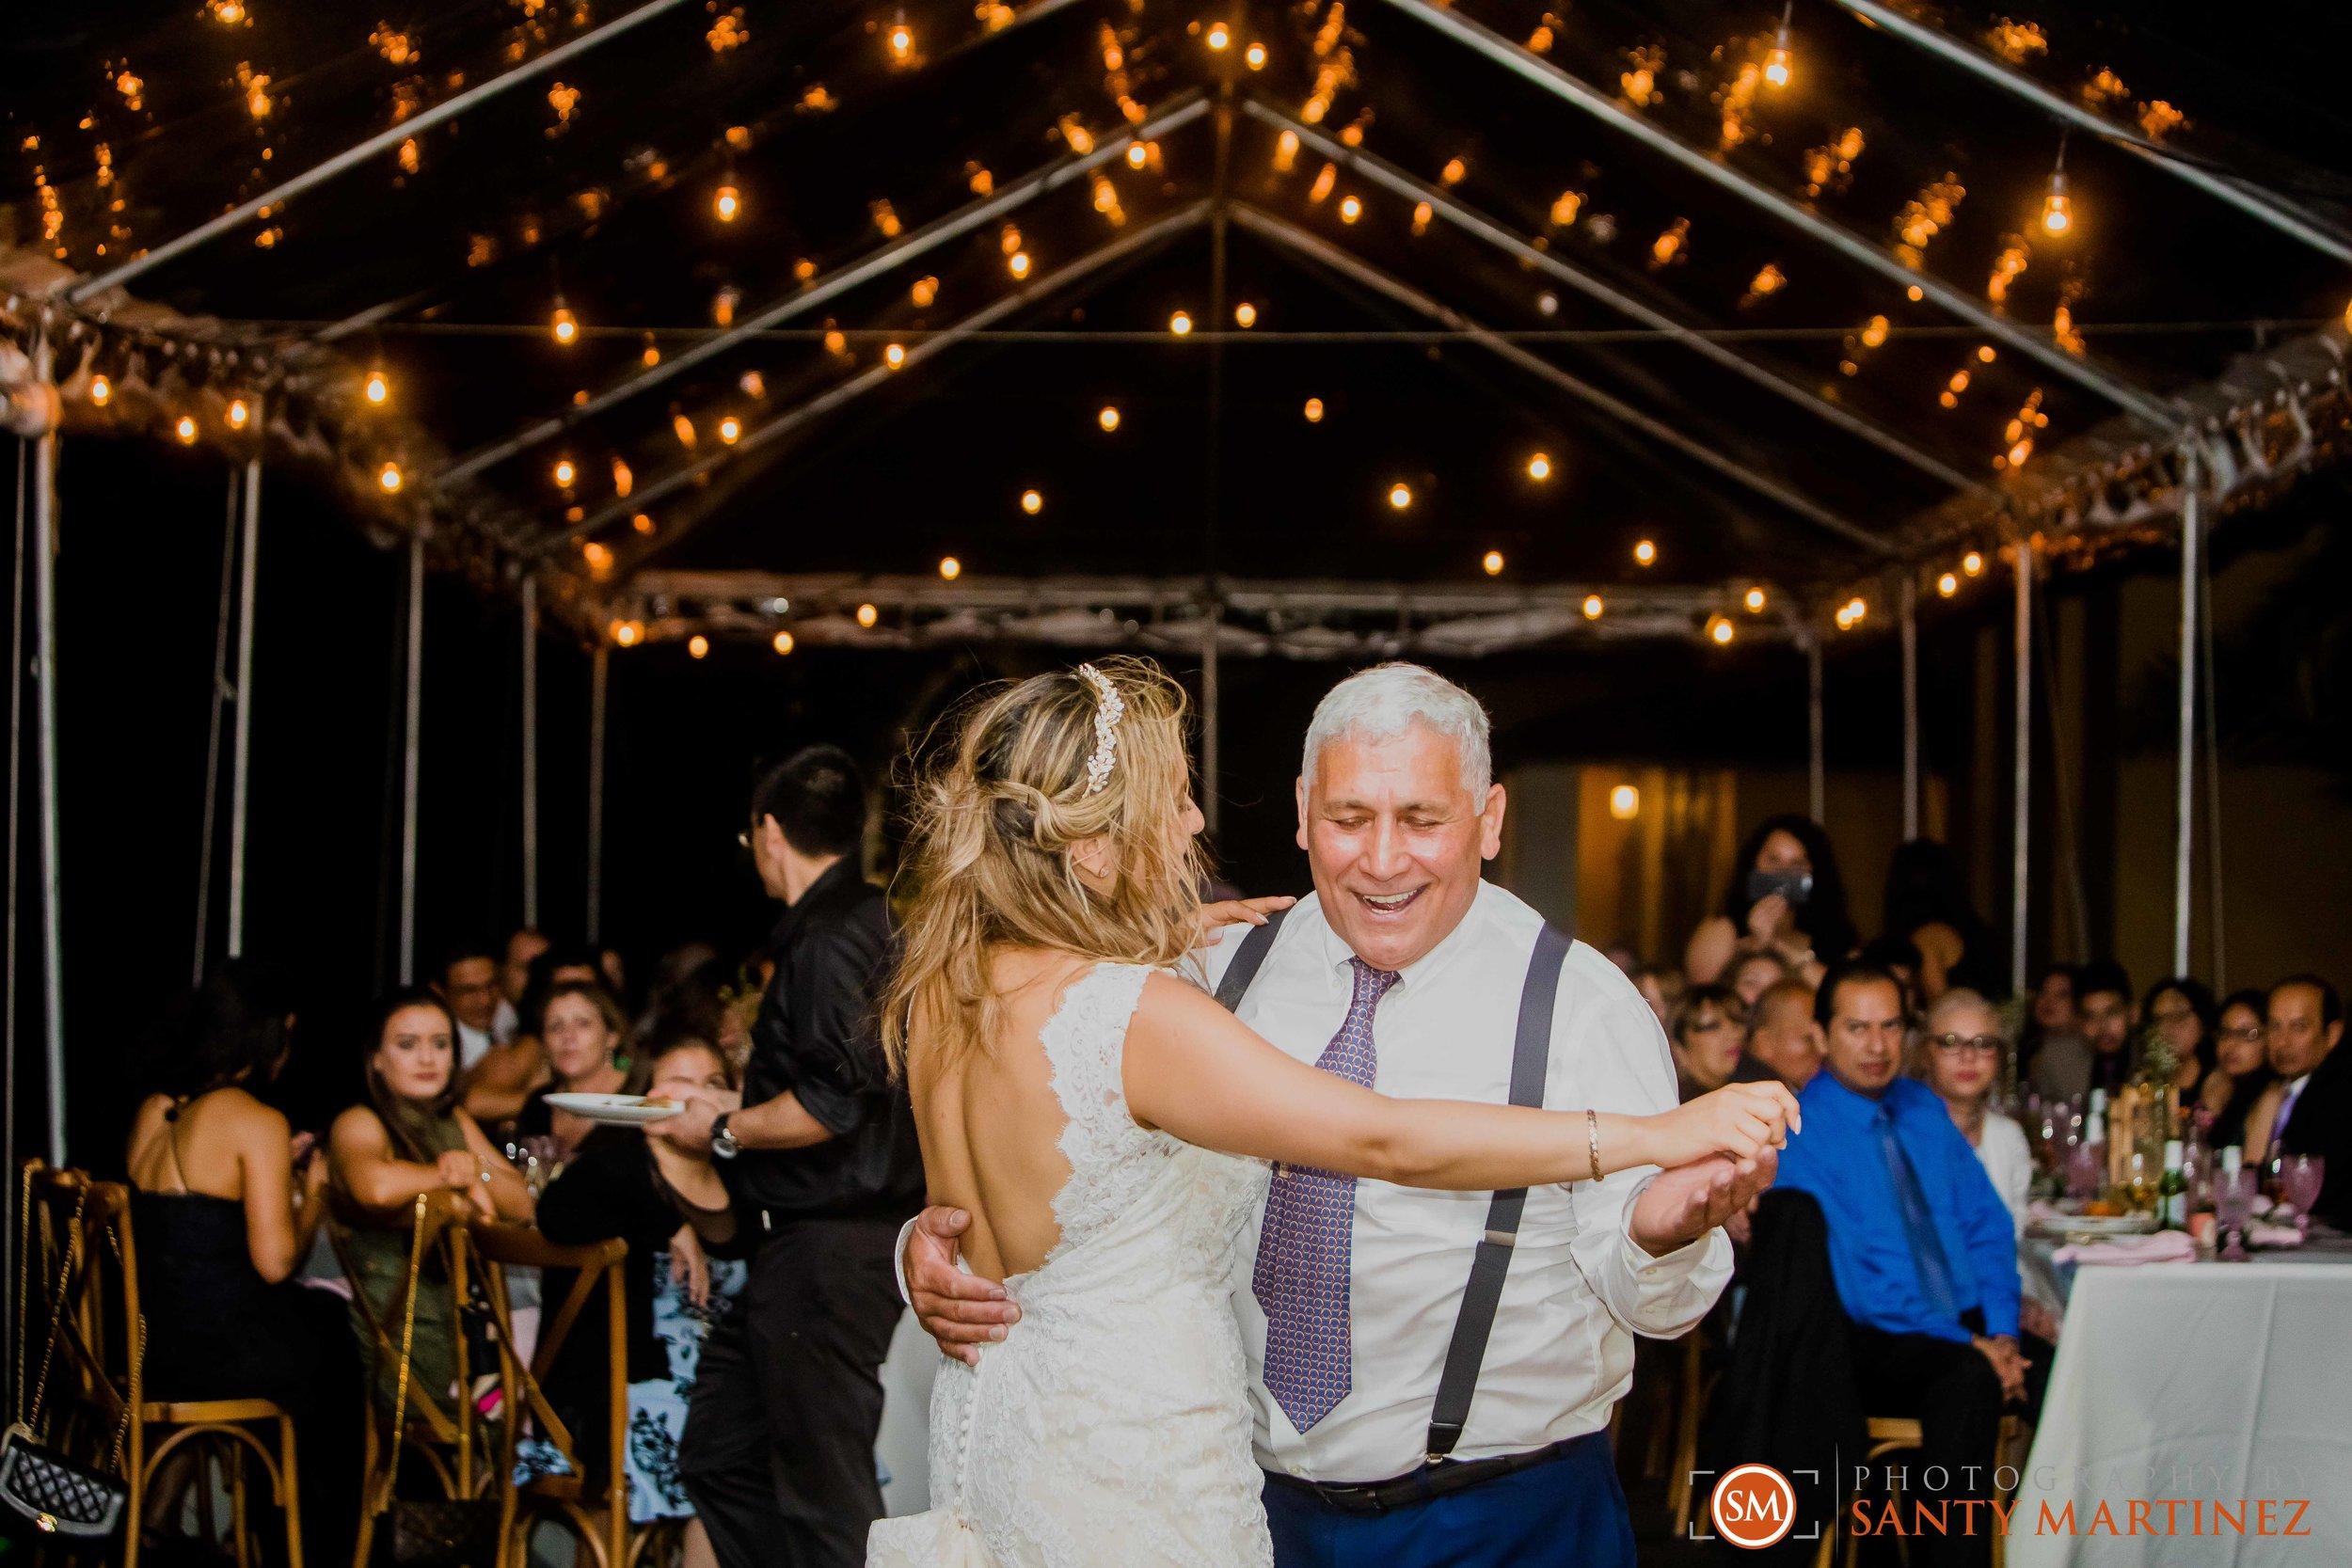 Wedding Bonnet House - Santy Martinez Photography-64.jpg